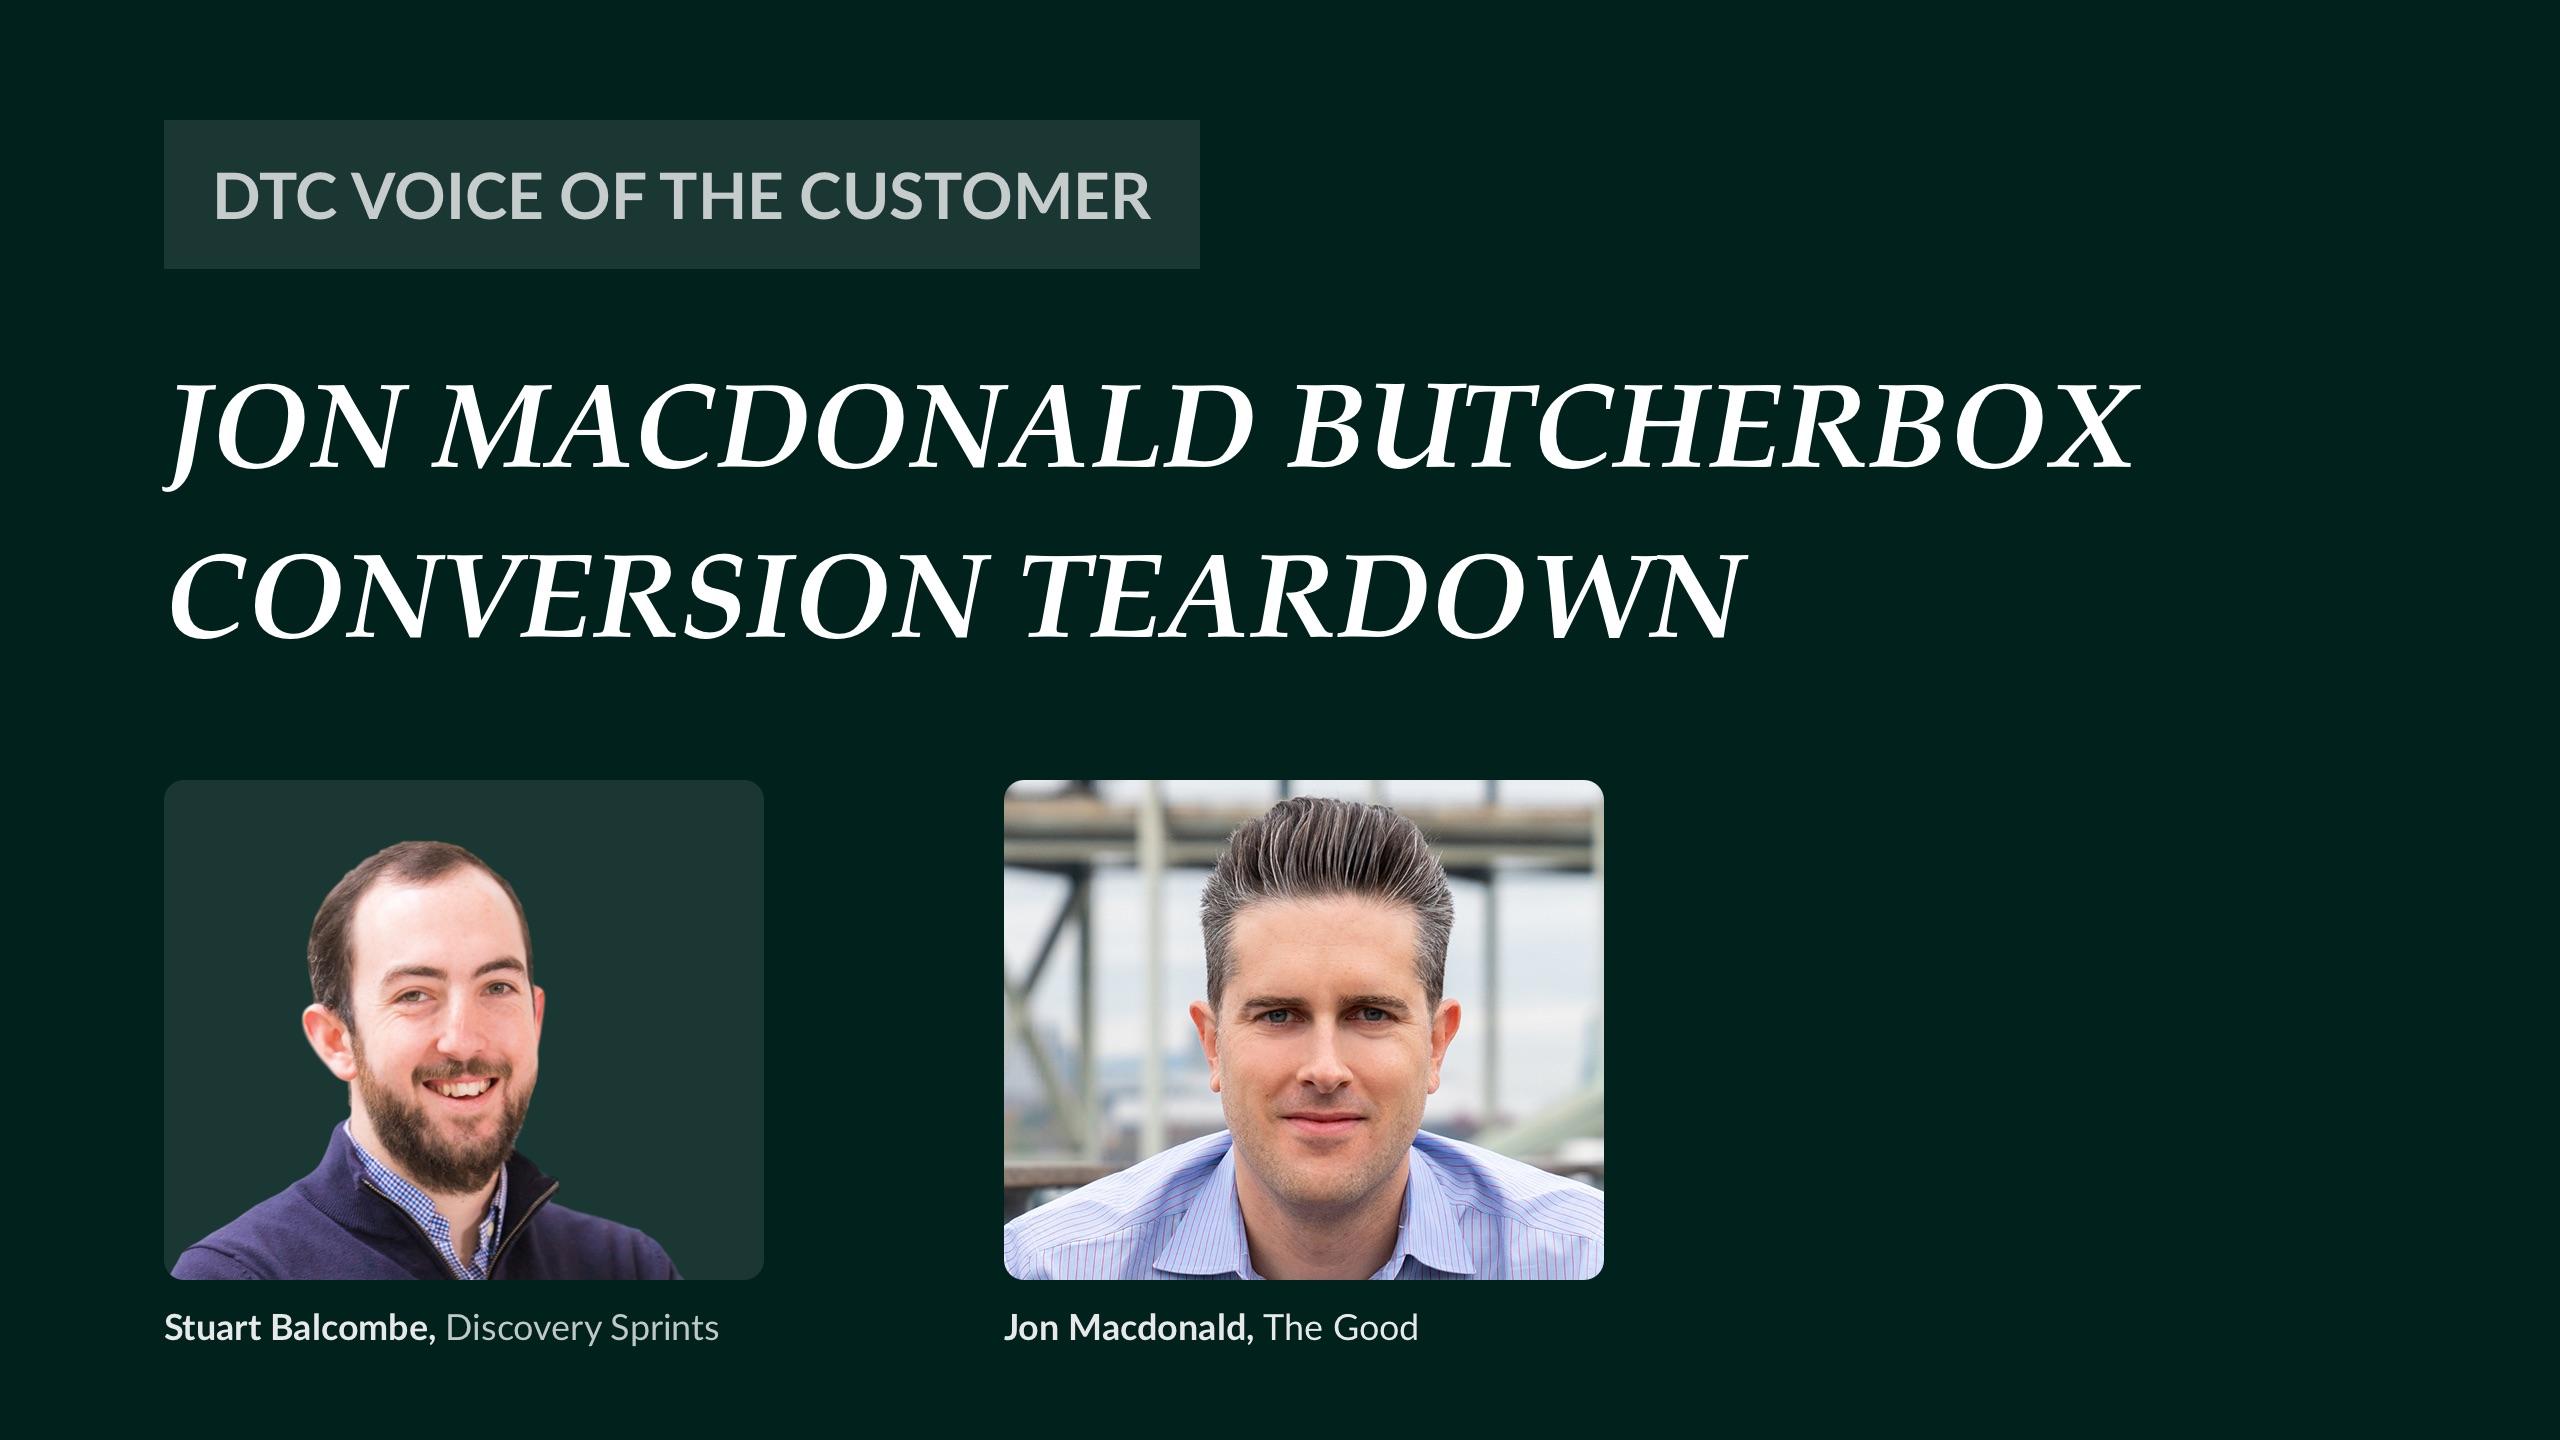 Jon MacDonald ButcherBox conversion teardown